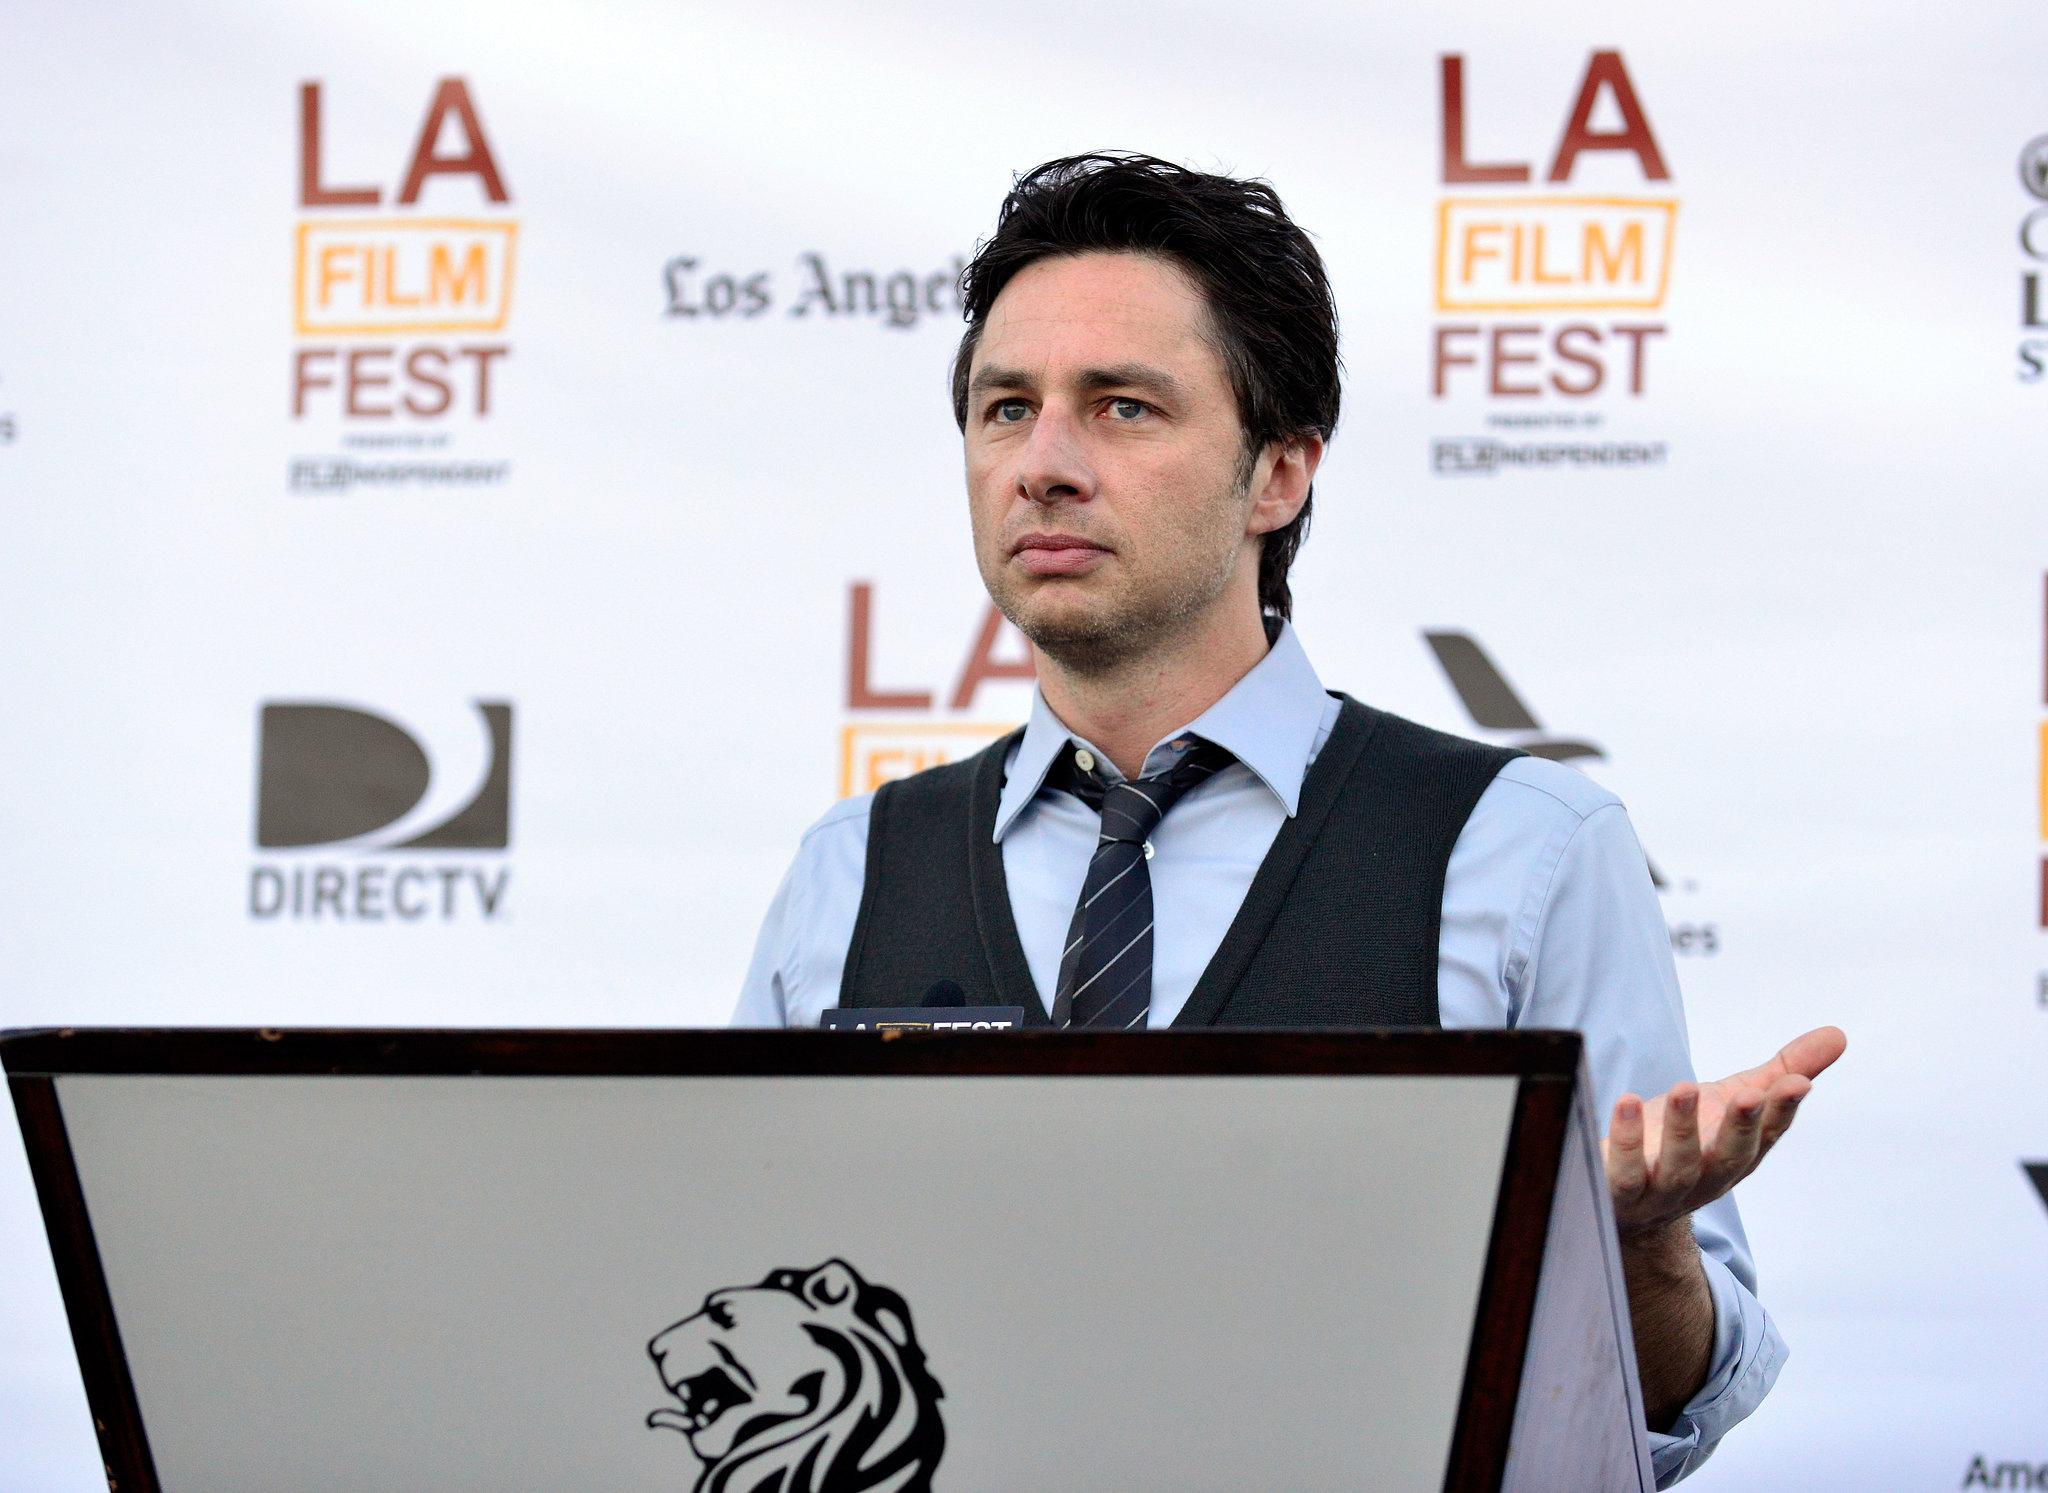 Zach Braff spoke at the filmmaker reception at the LA Film Festival.